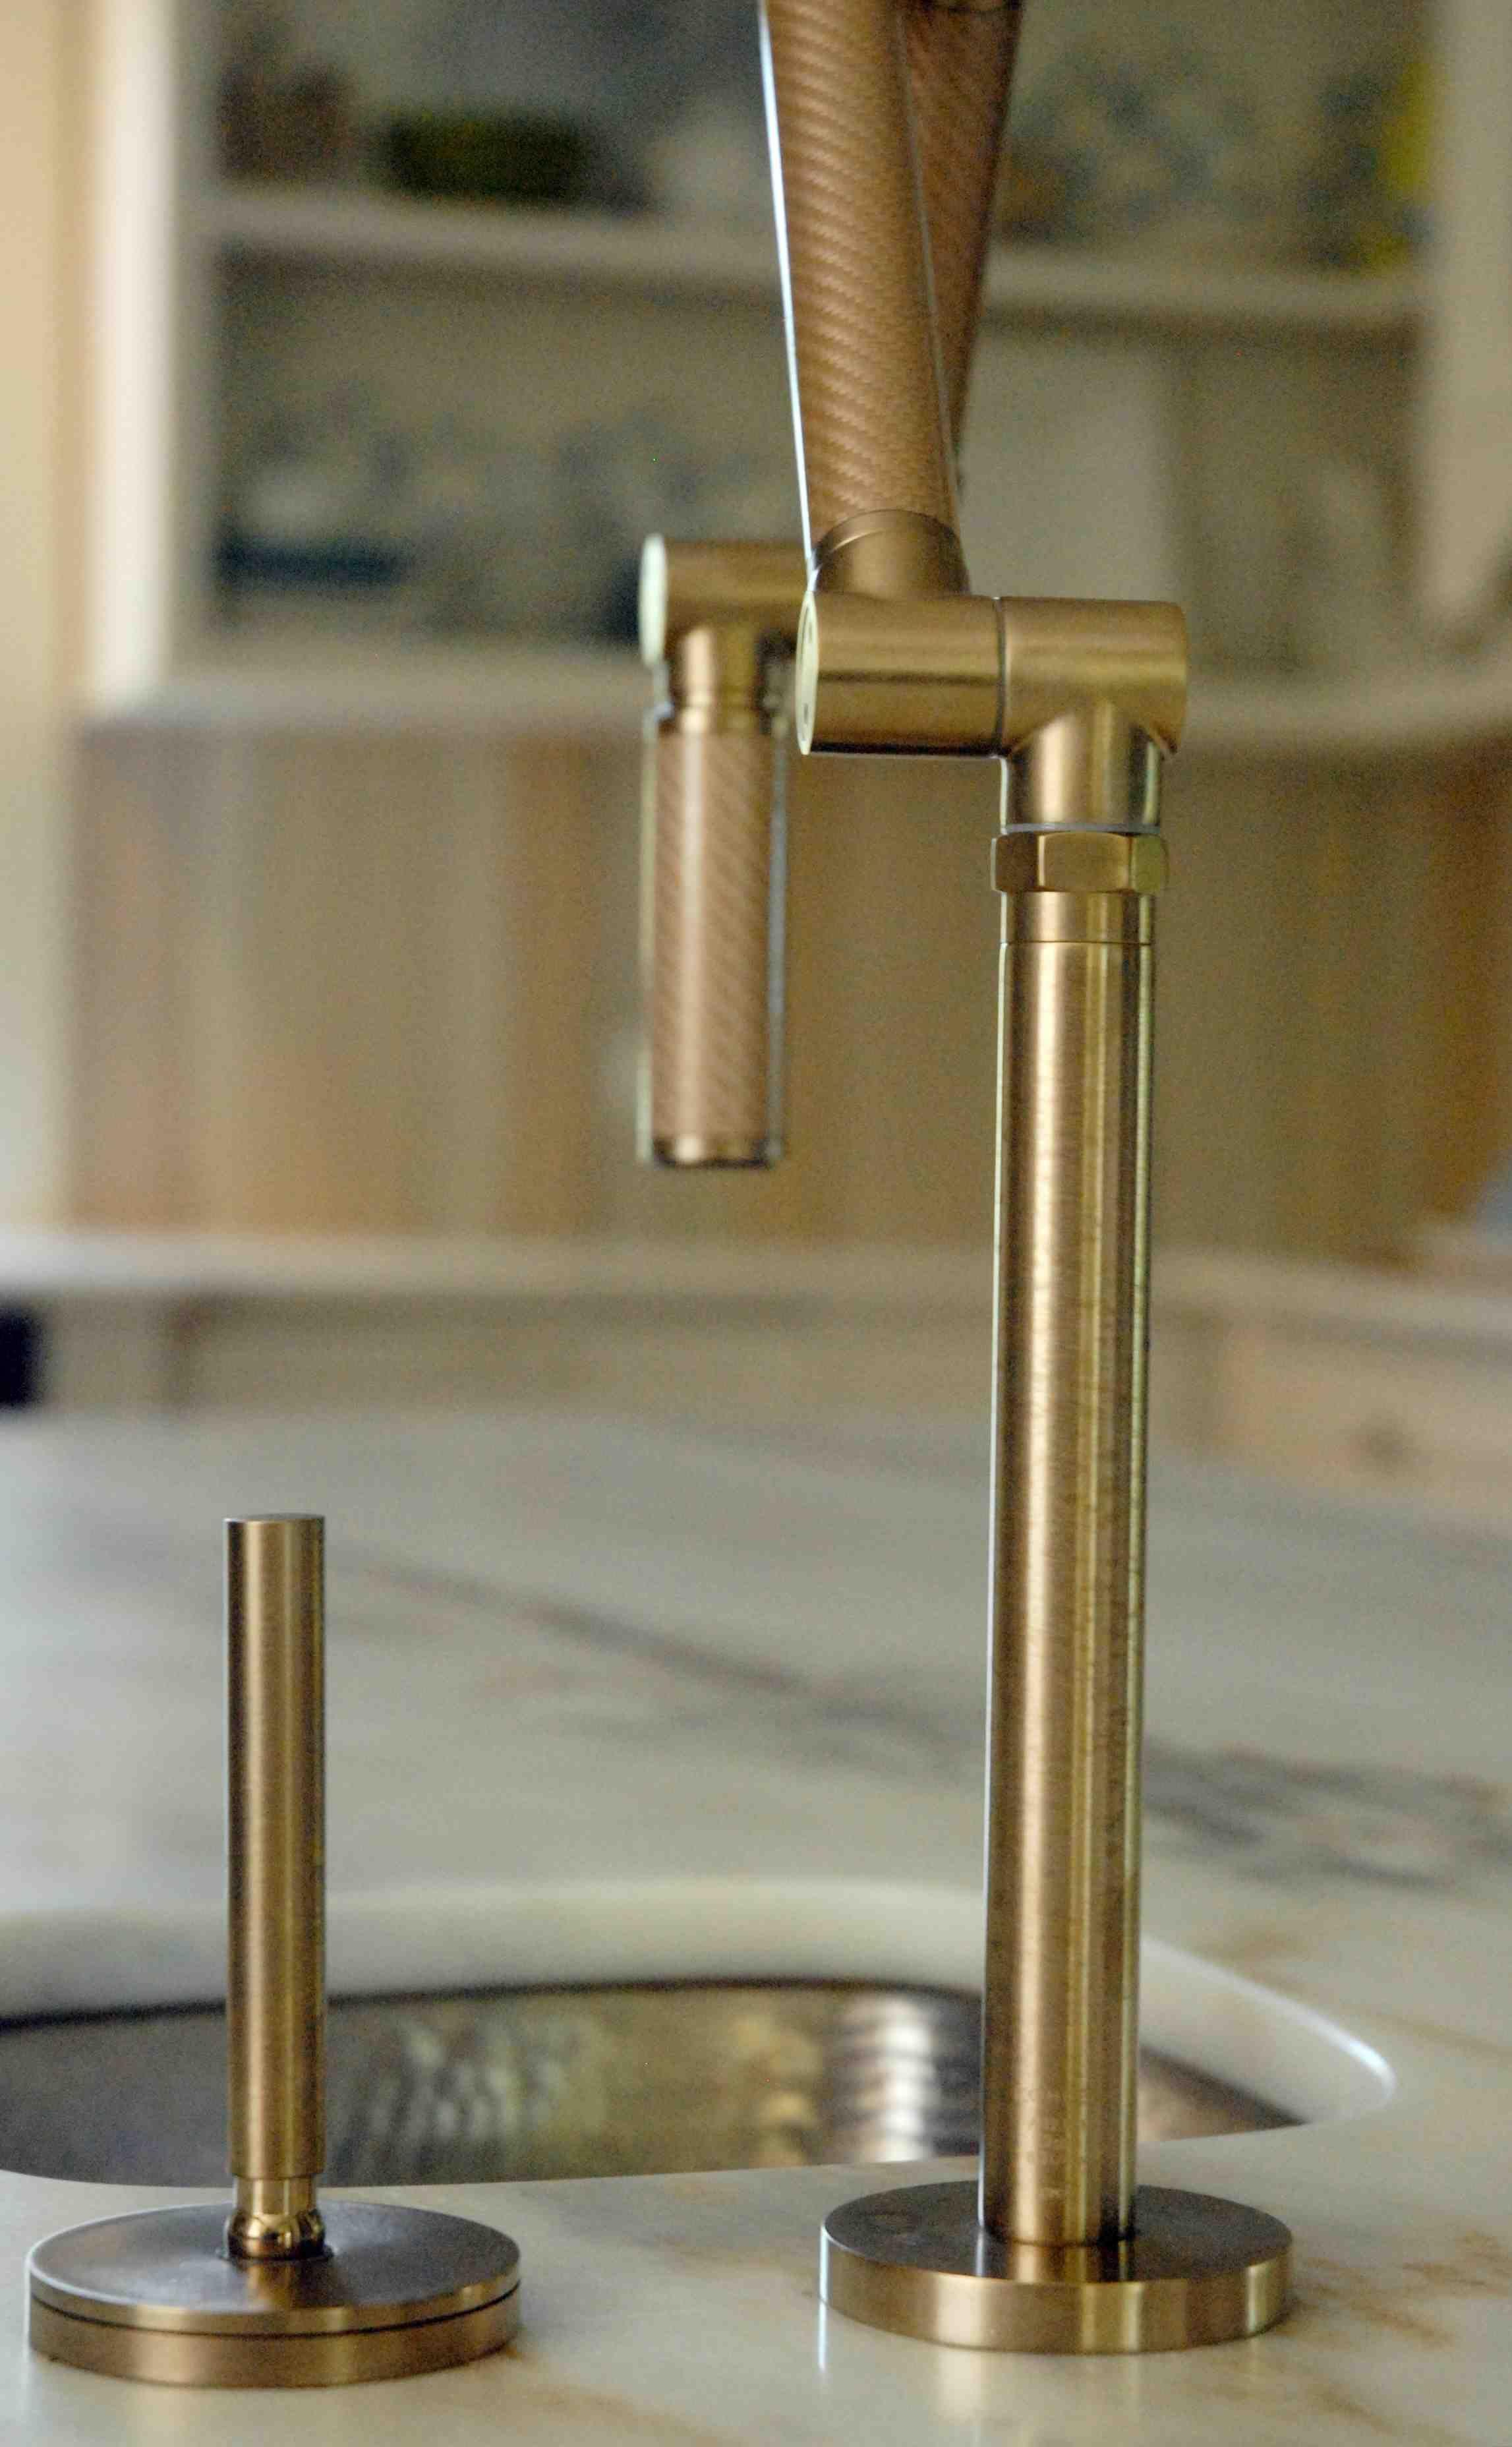 The karbon faucet kohler bath bwdesigncenter bwplumbing